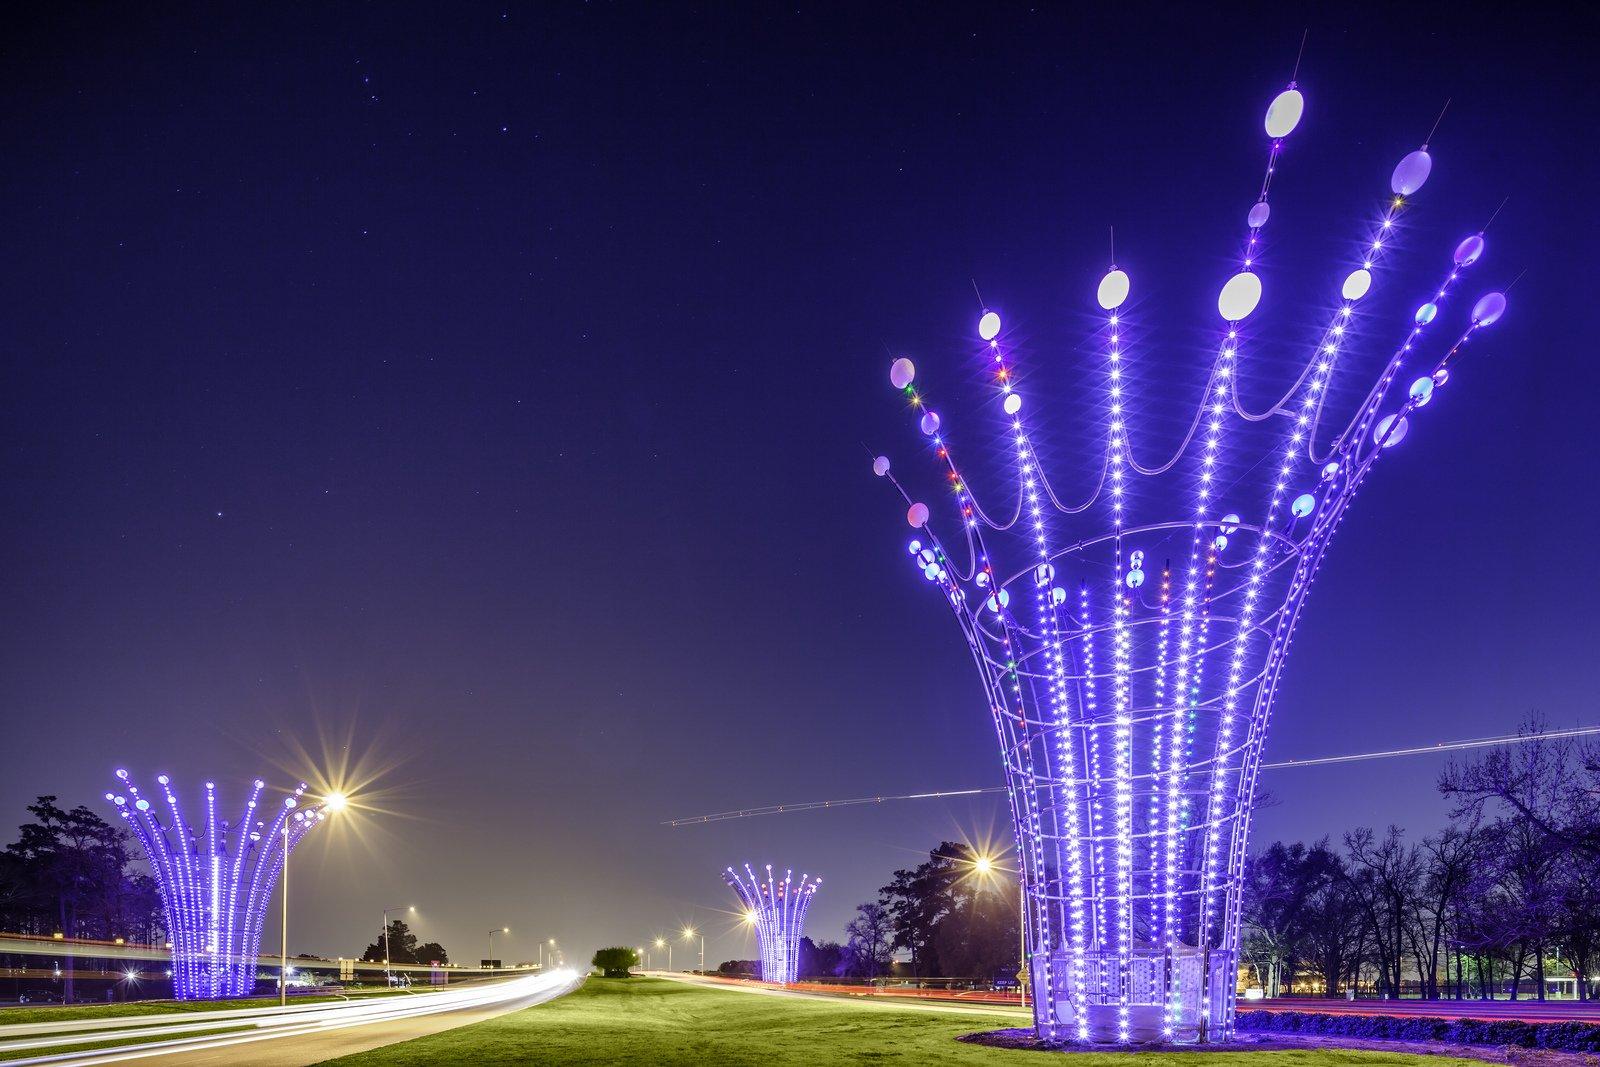 Houston architecture bridges cities City texas Night towers buildings 1600x1067